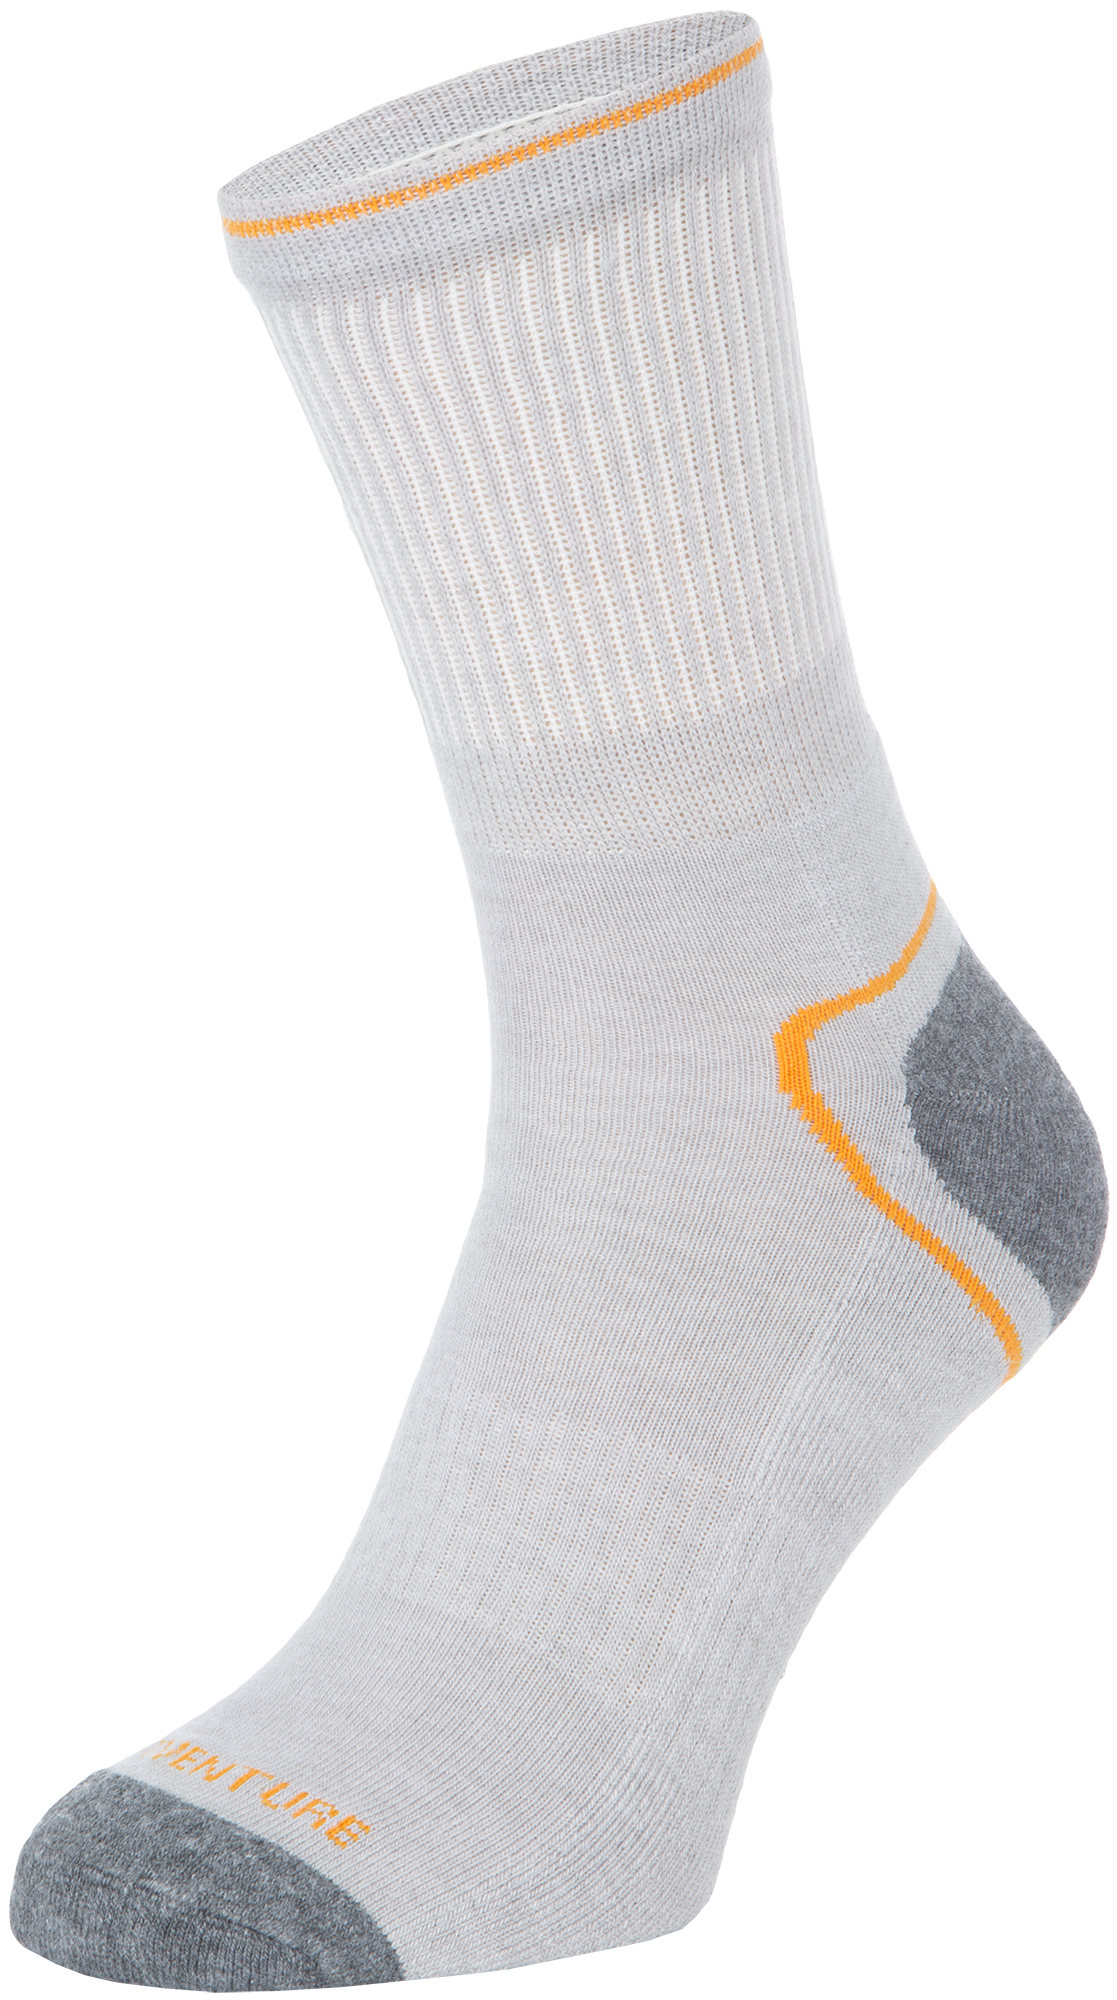 Outventure Носки Outventure, 1 пара, размер 43-46 носки для велосипедистов santo coolmax s022